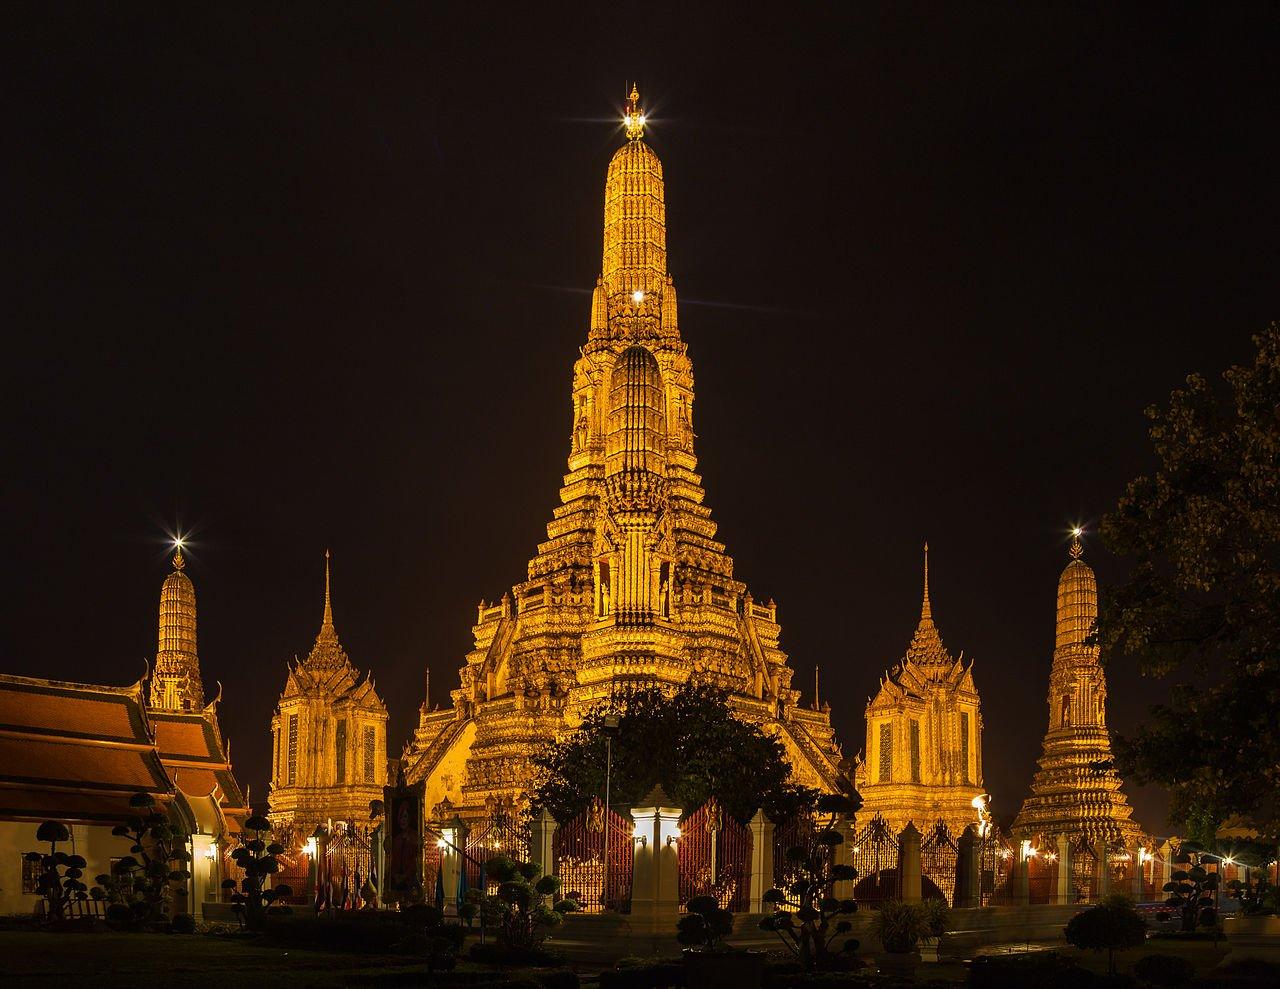 1280px-Templo_Wat_Arun,_Bangkok,_Tailandia,_2013-08-22,_DD_37